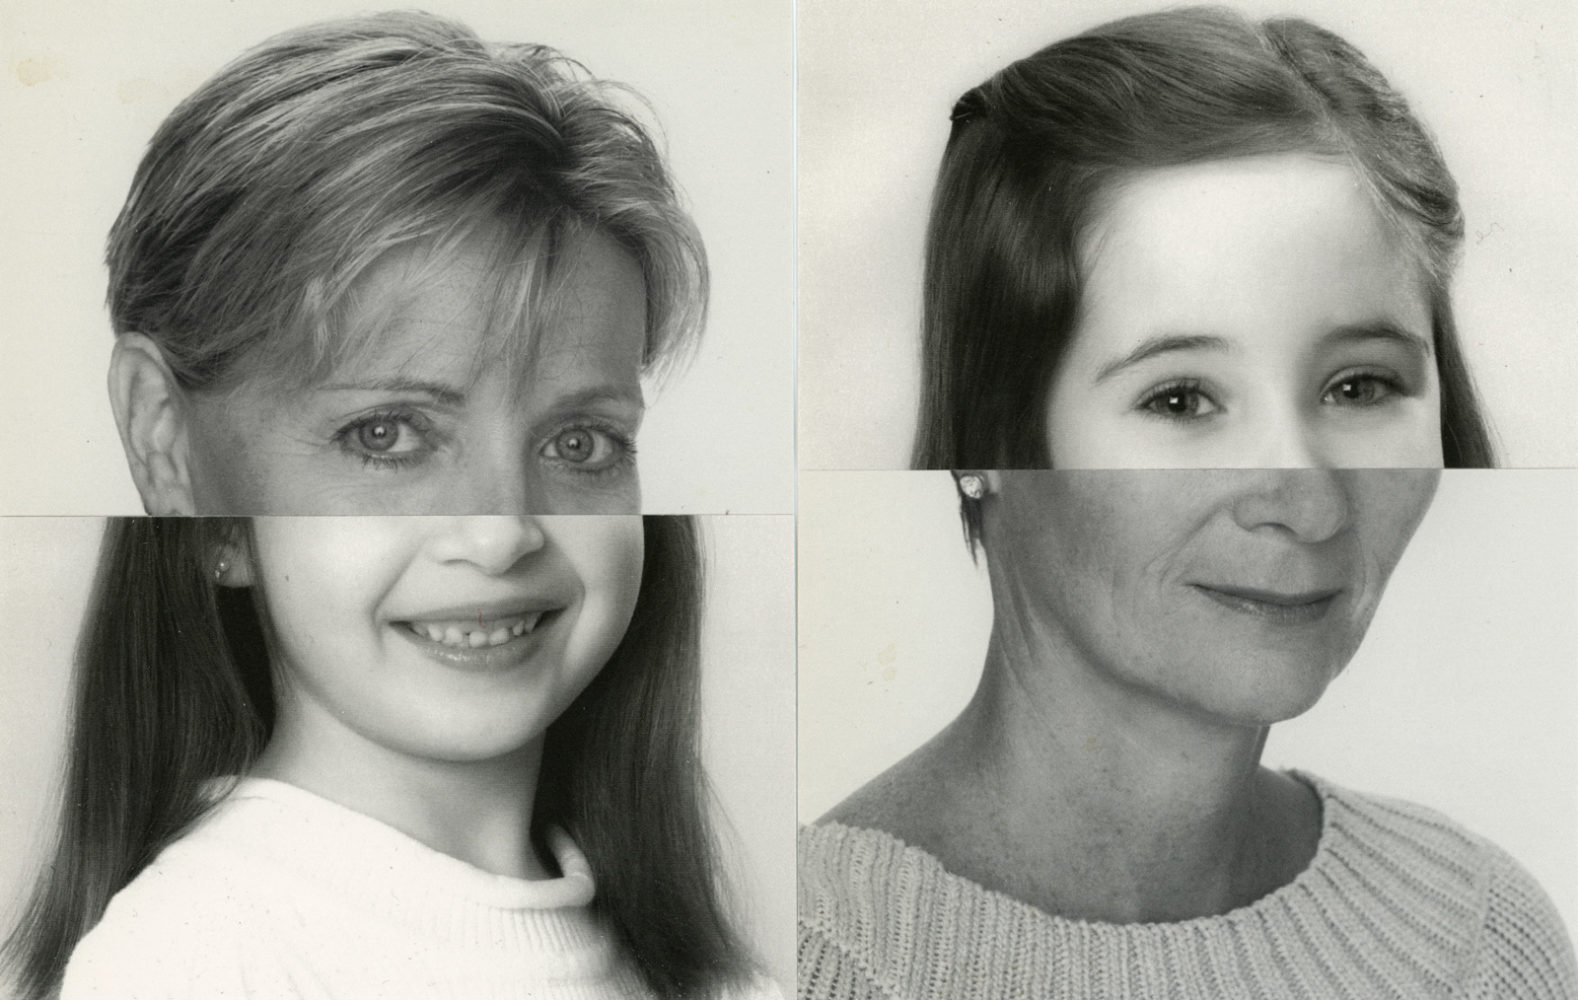 Gene Splitting - collage by Paul Dodd 2021